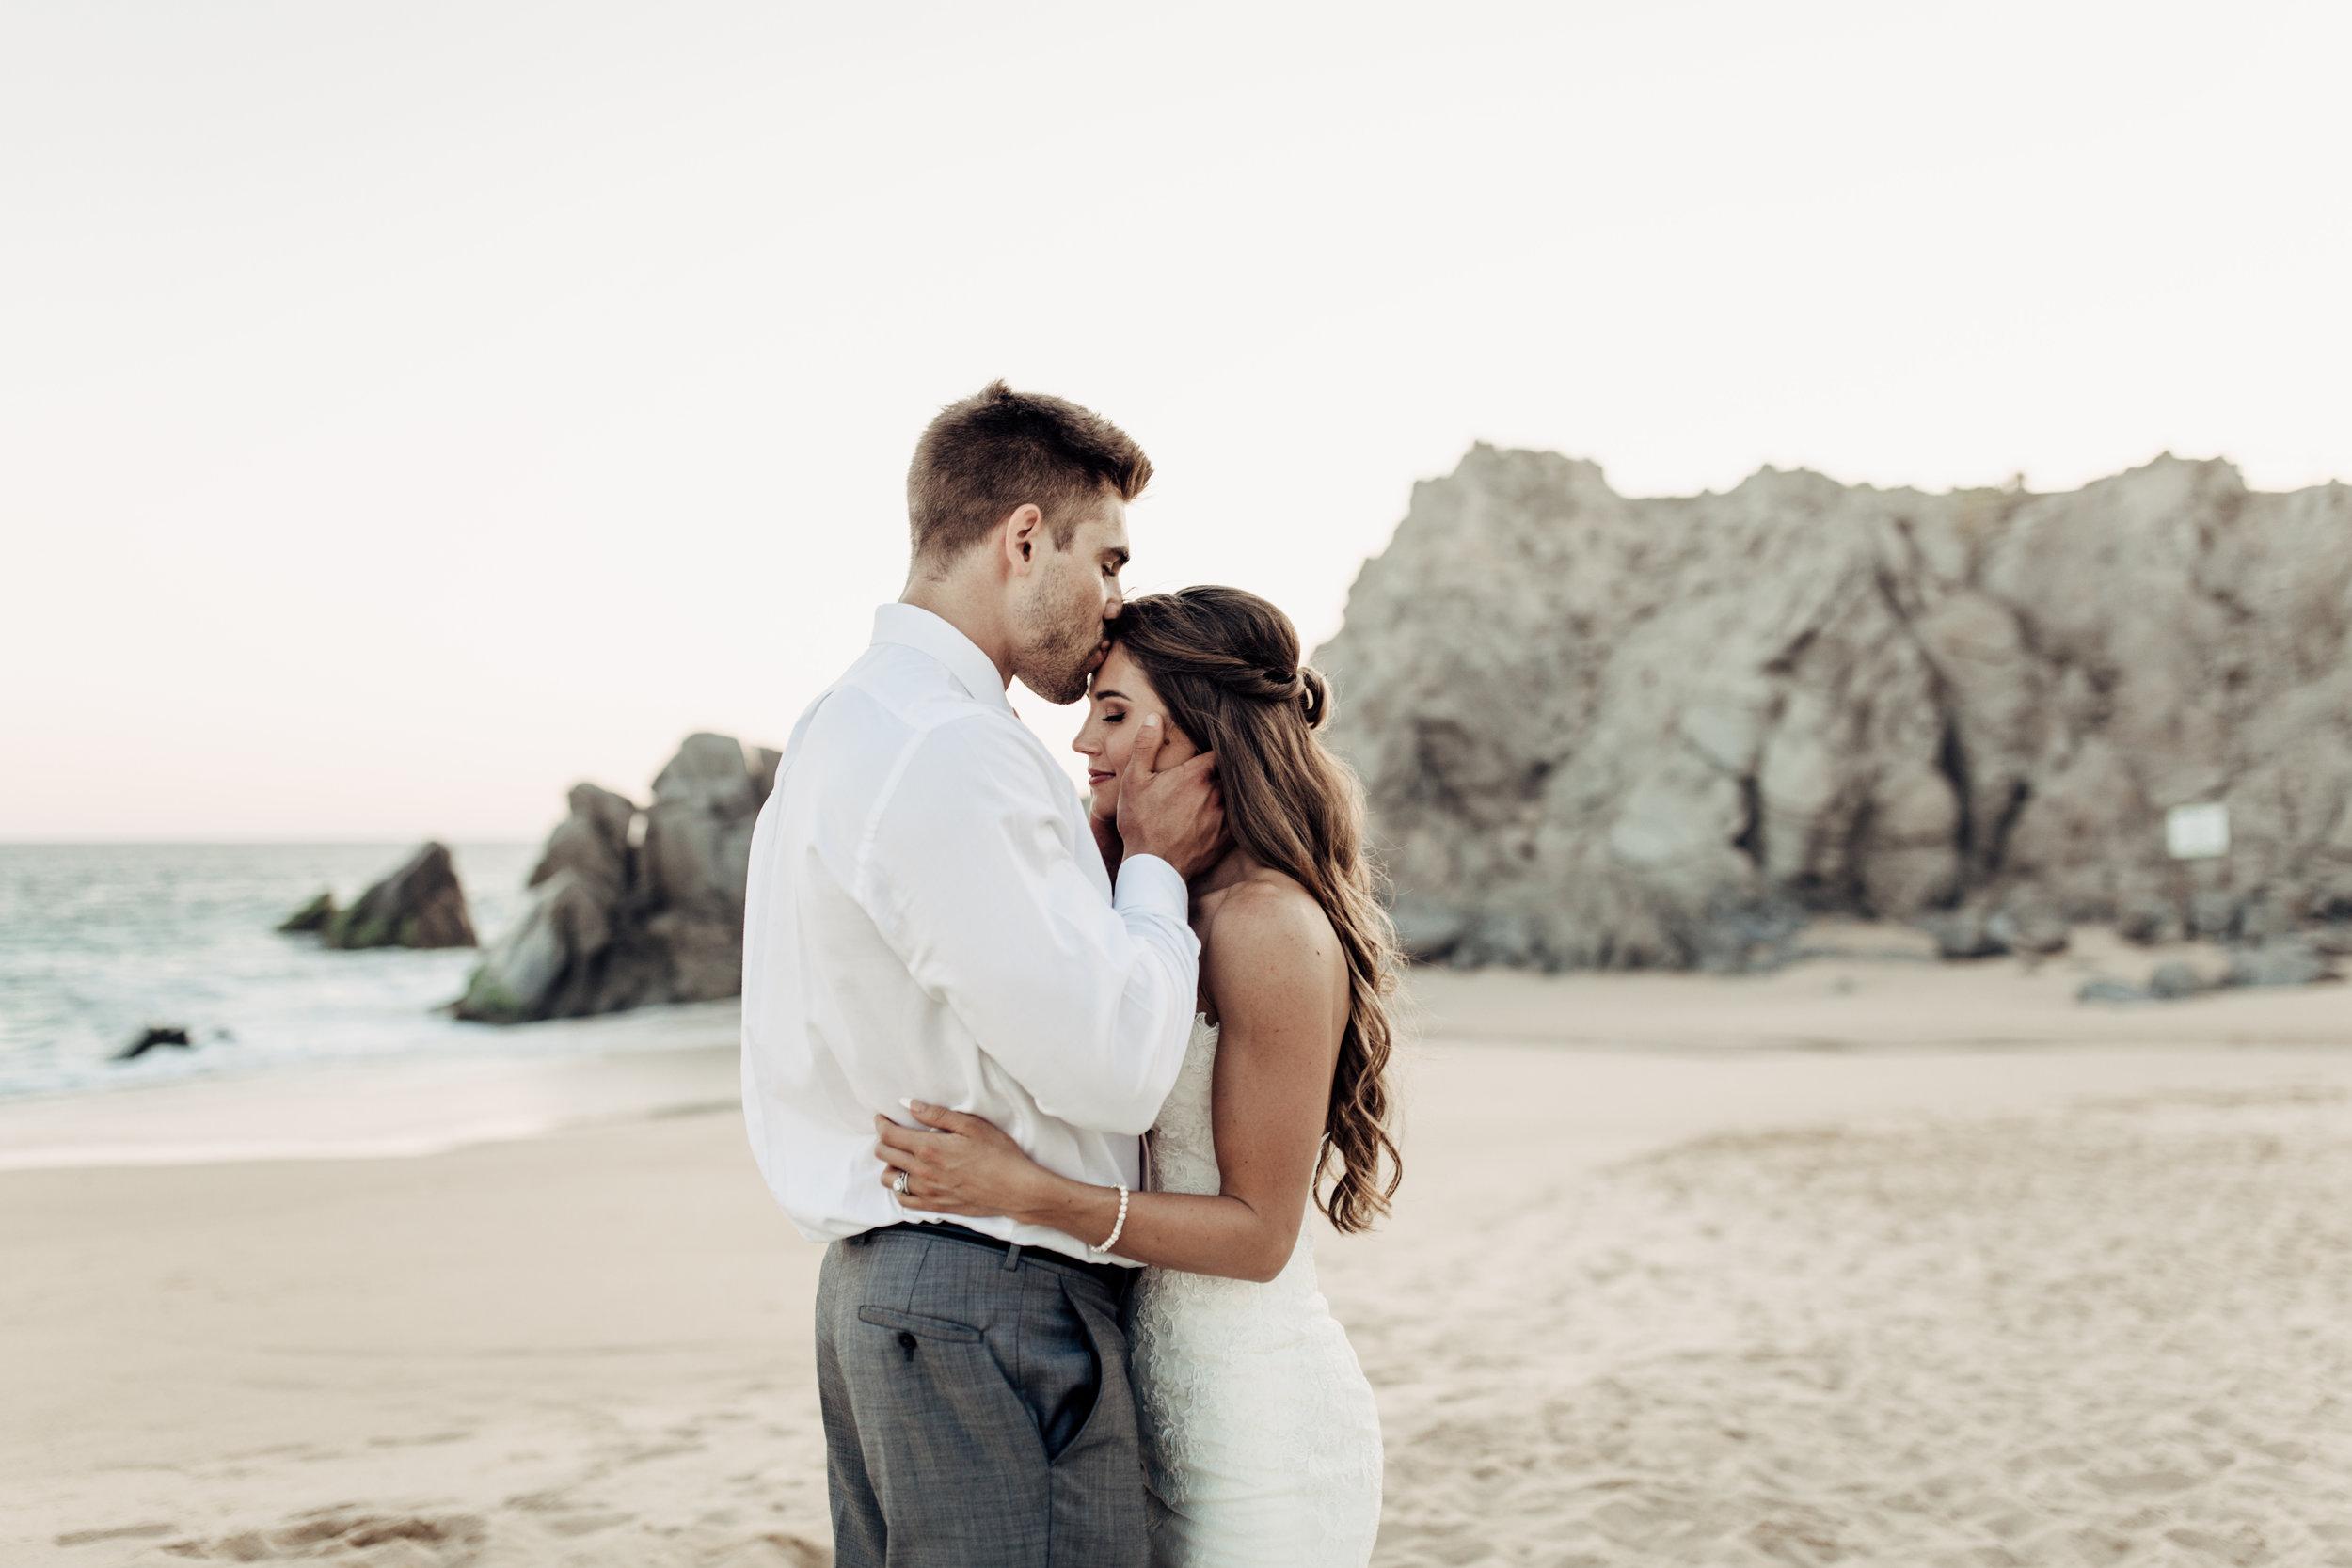 pueblo-bonito-sunset-beach-wedding-cabo-san-lucas534.jpg